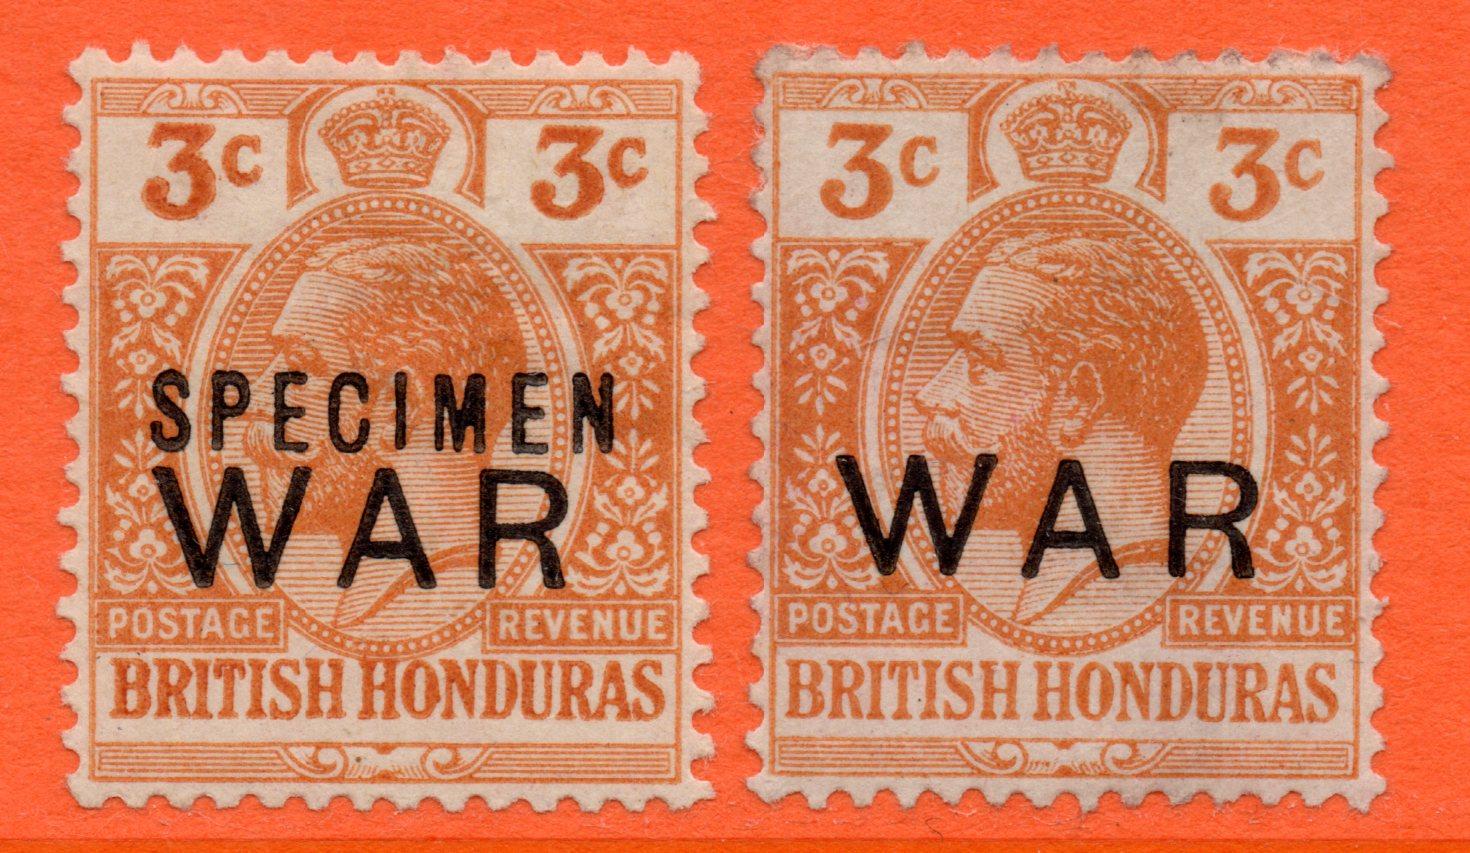 British Honduras GV 1918 3c Orange WAR Ovpt SPECIMEN c/w Ordinary SG120s